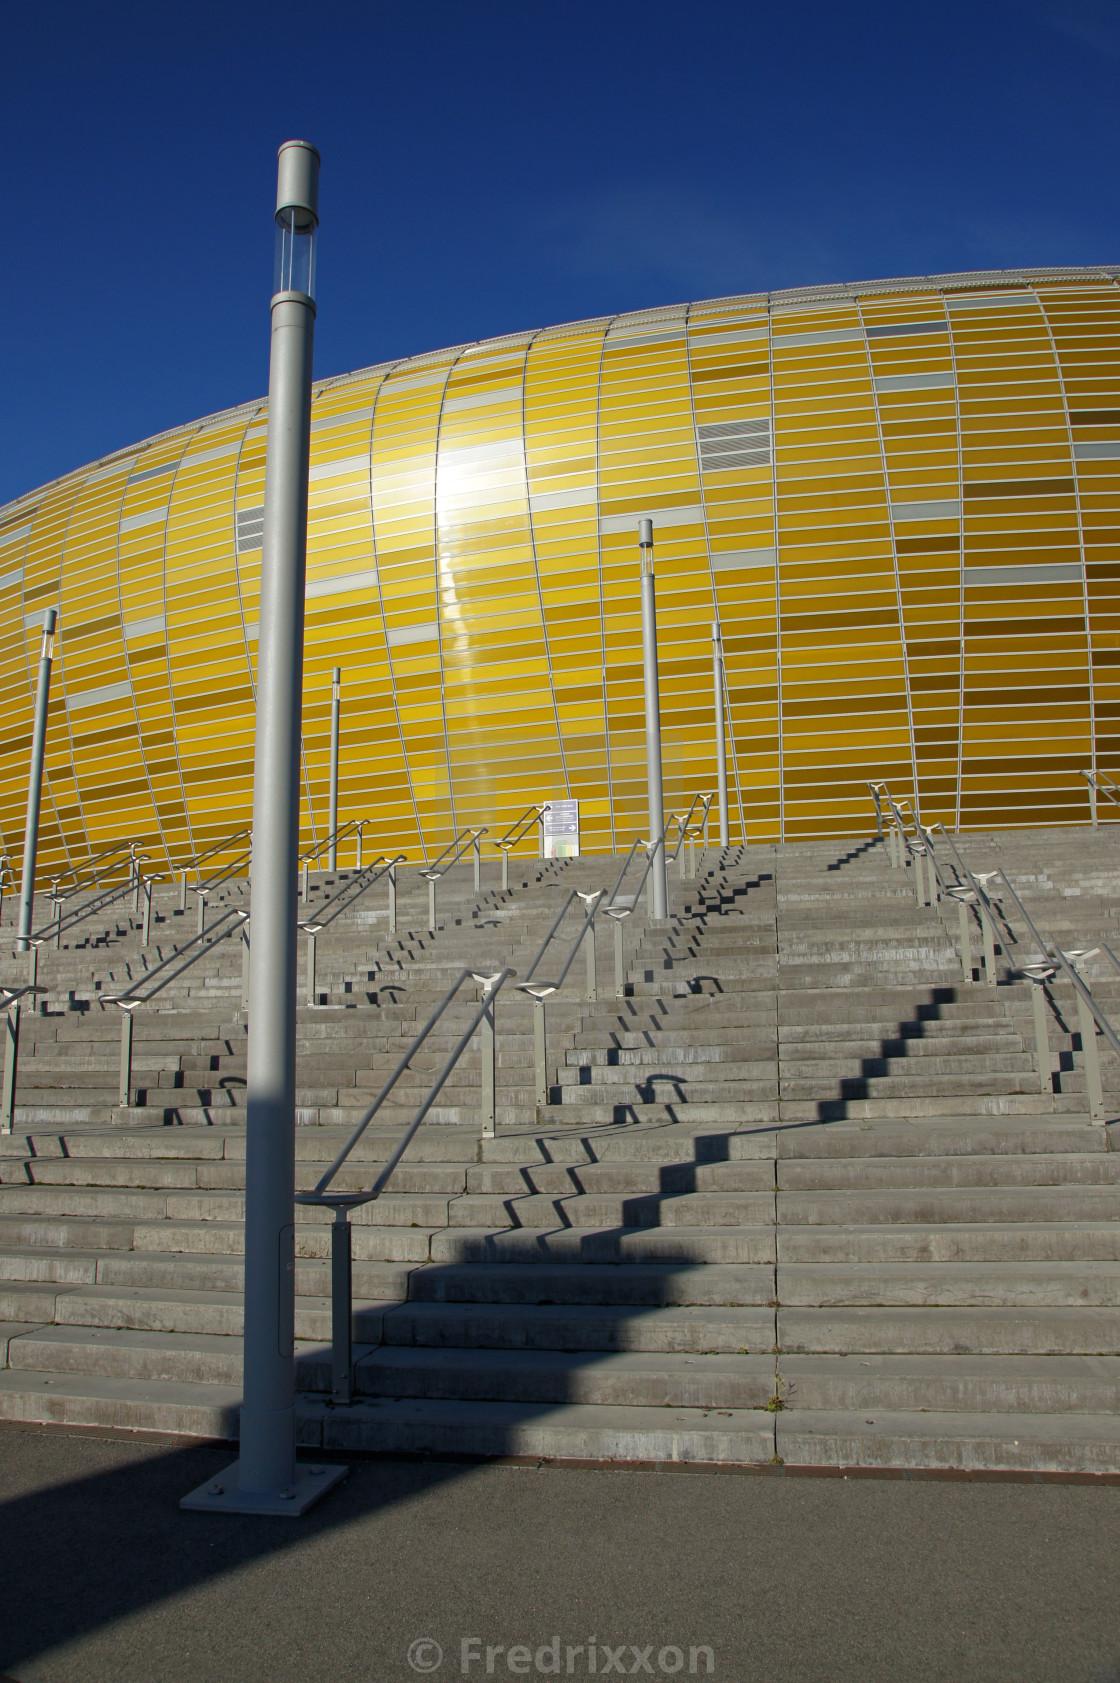 """Euro 2012 stadium in Gdansk, Poland."" stock image"